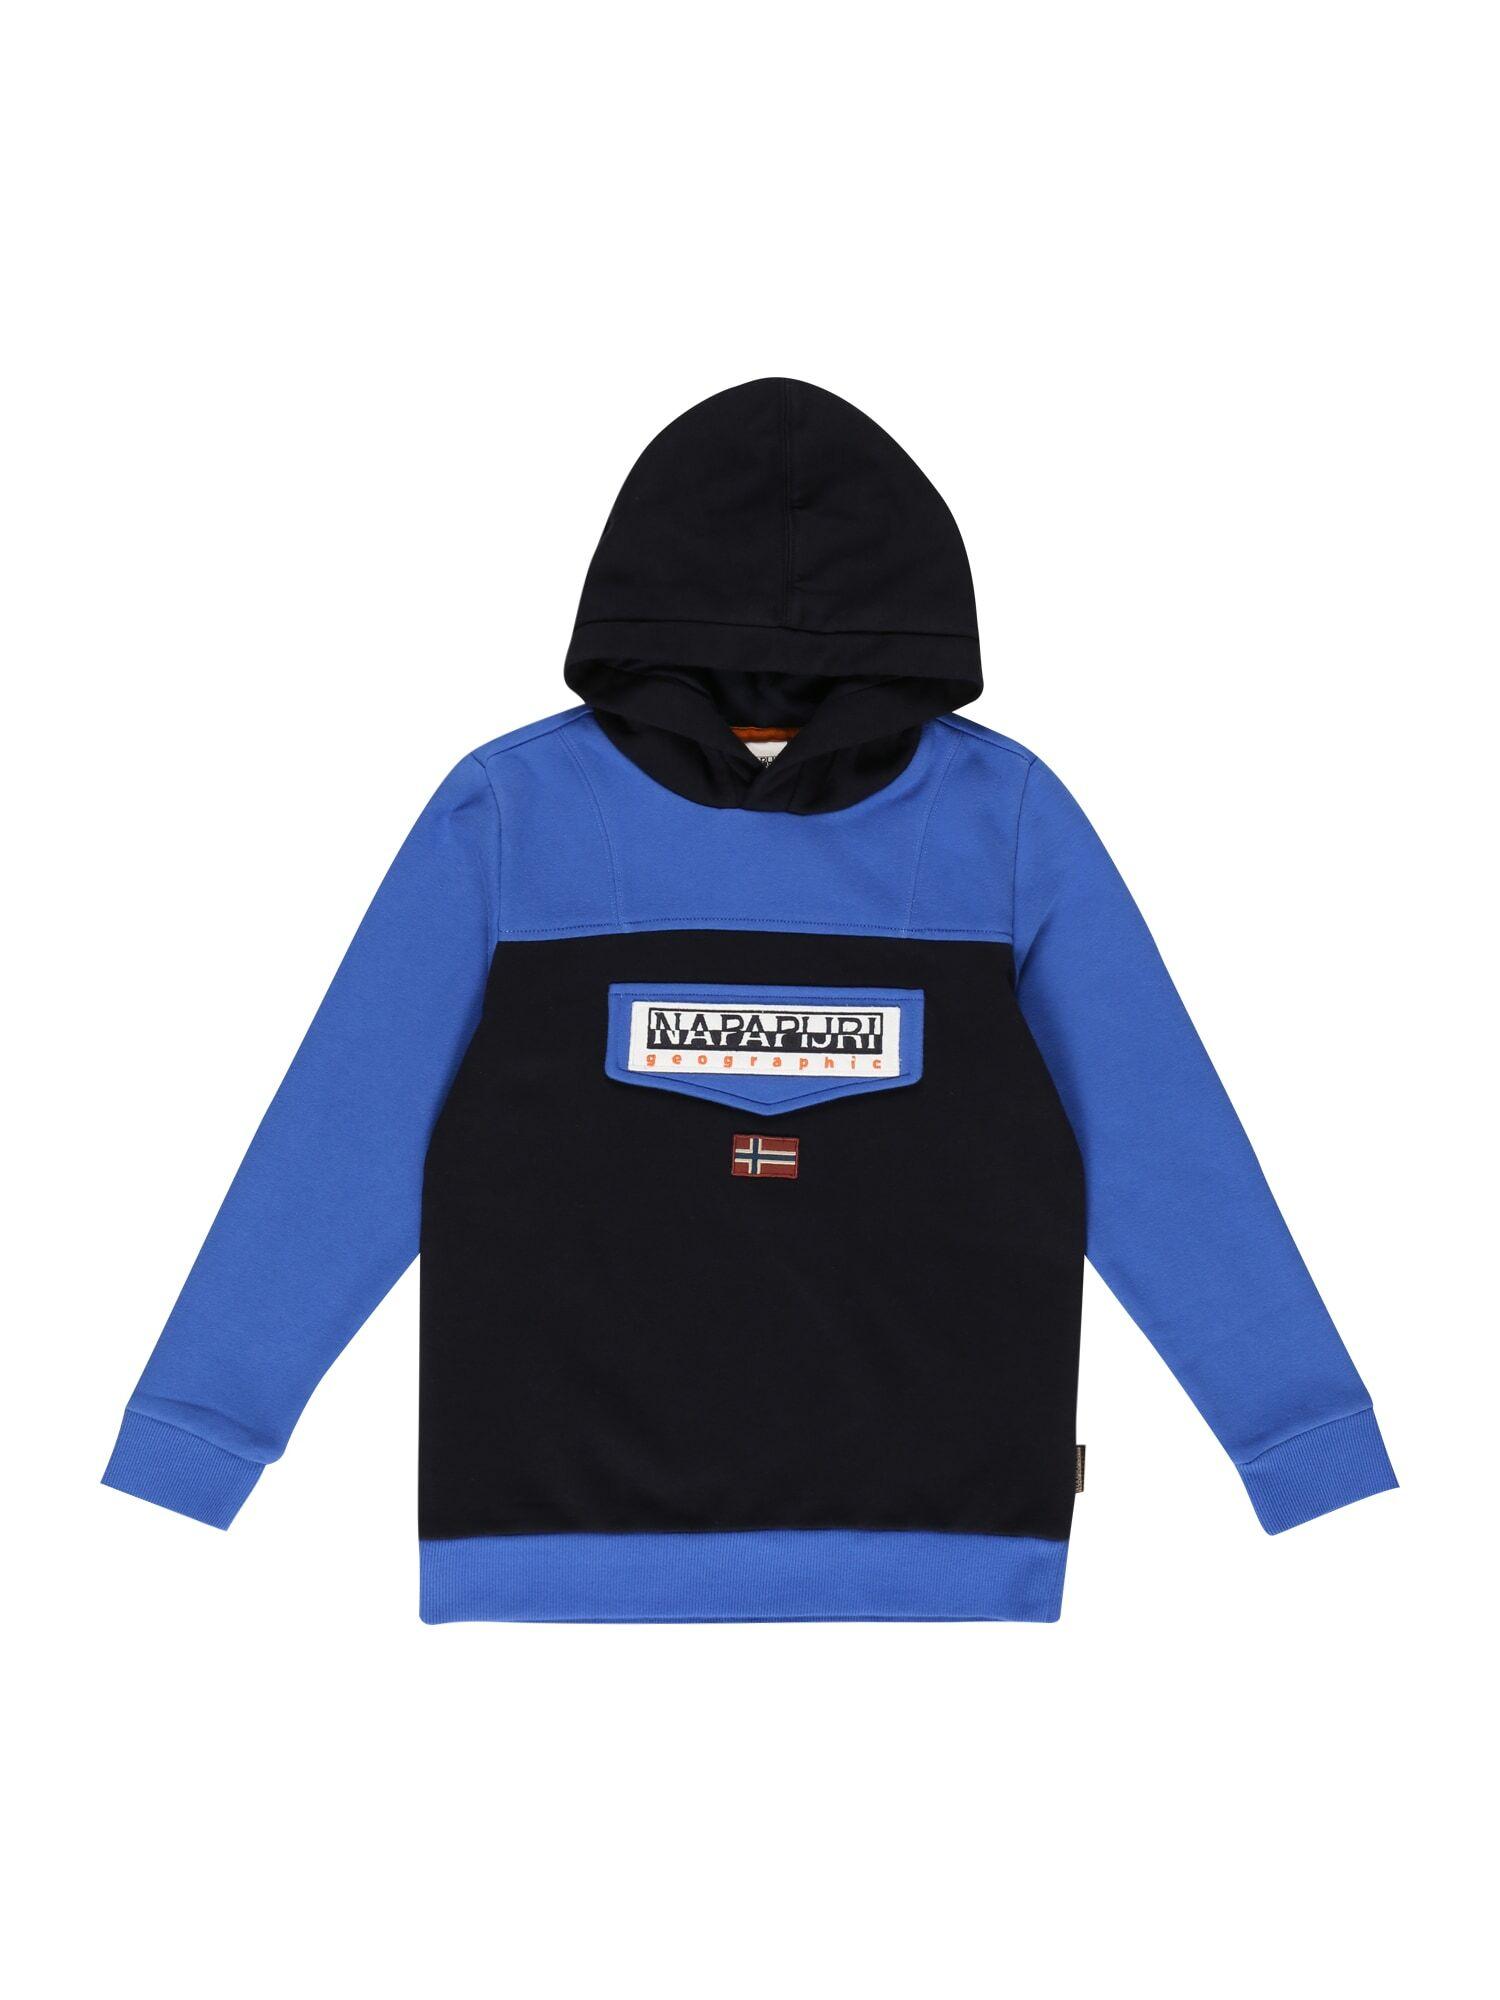 NAPAPIJRI Sweat-shirt 'BURGEE'  - Bleu - Taille: 14 - girl